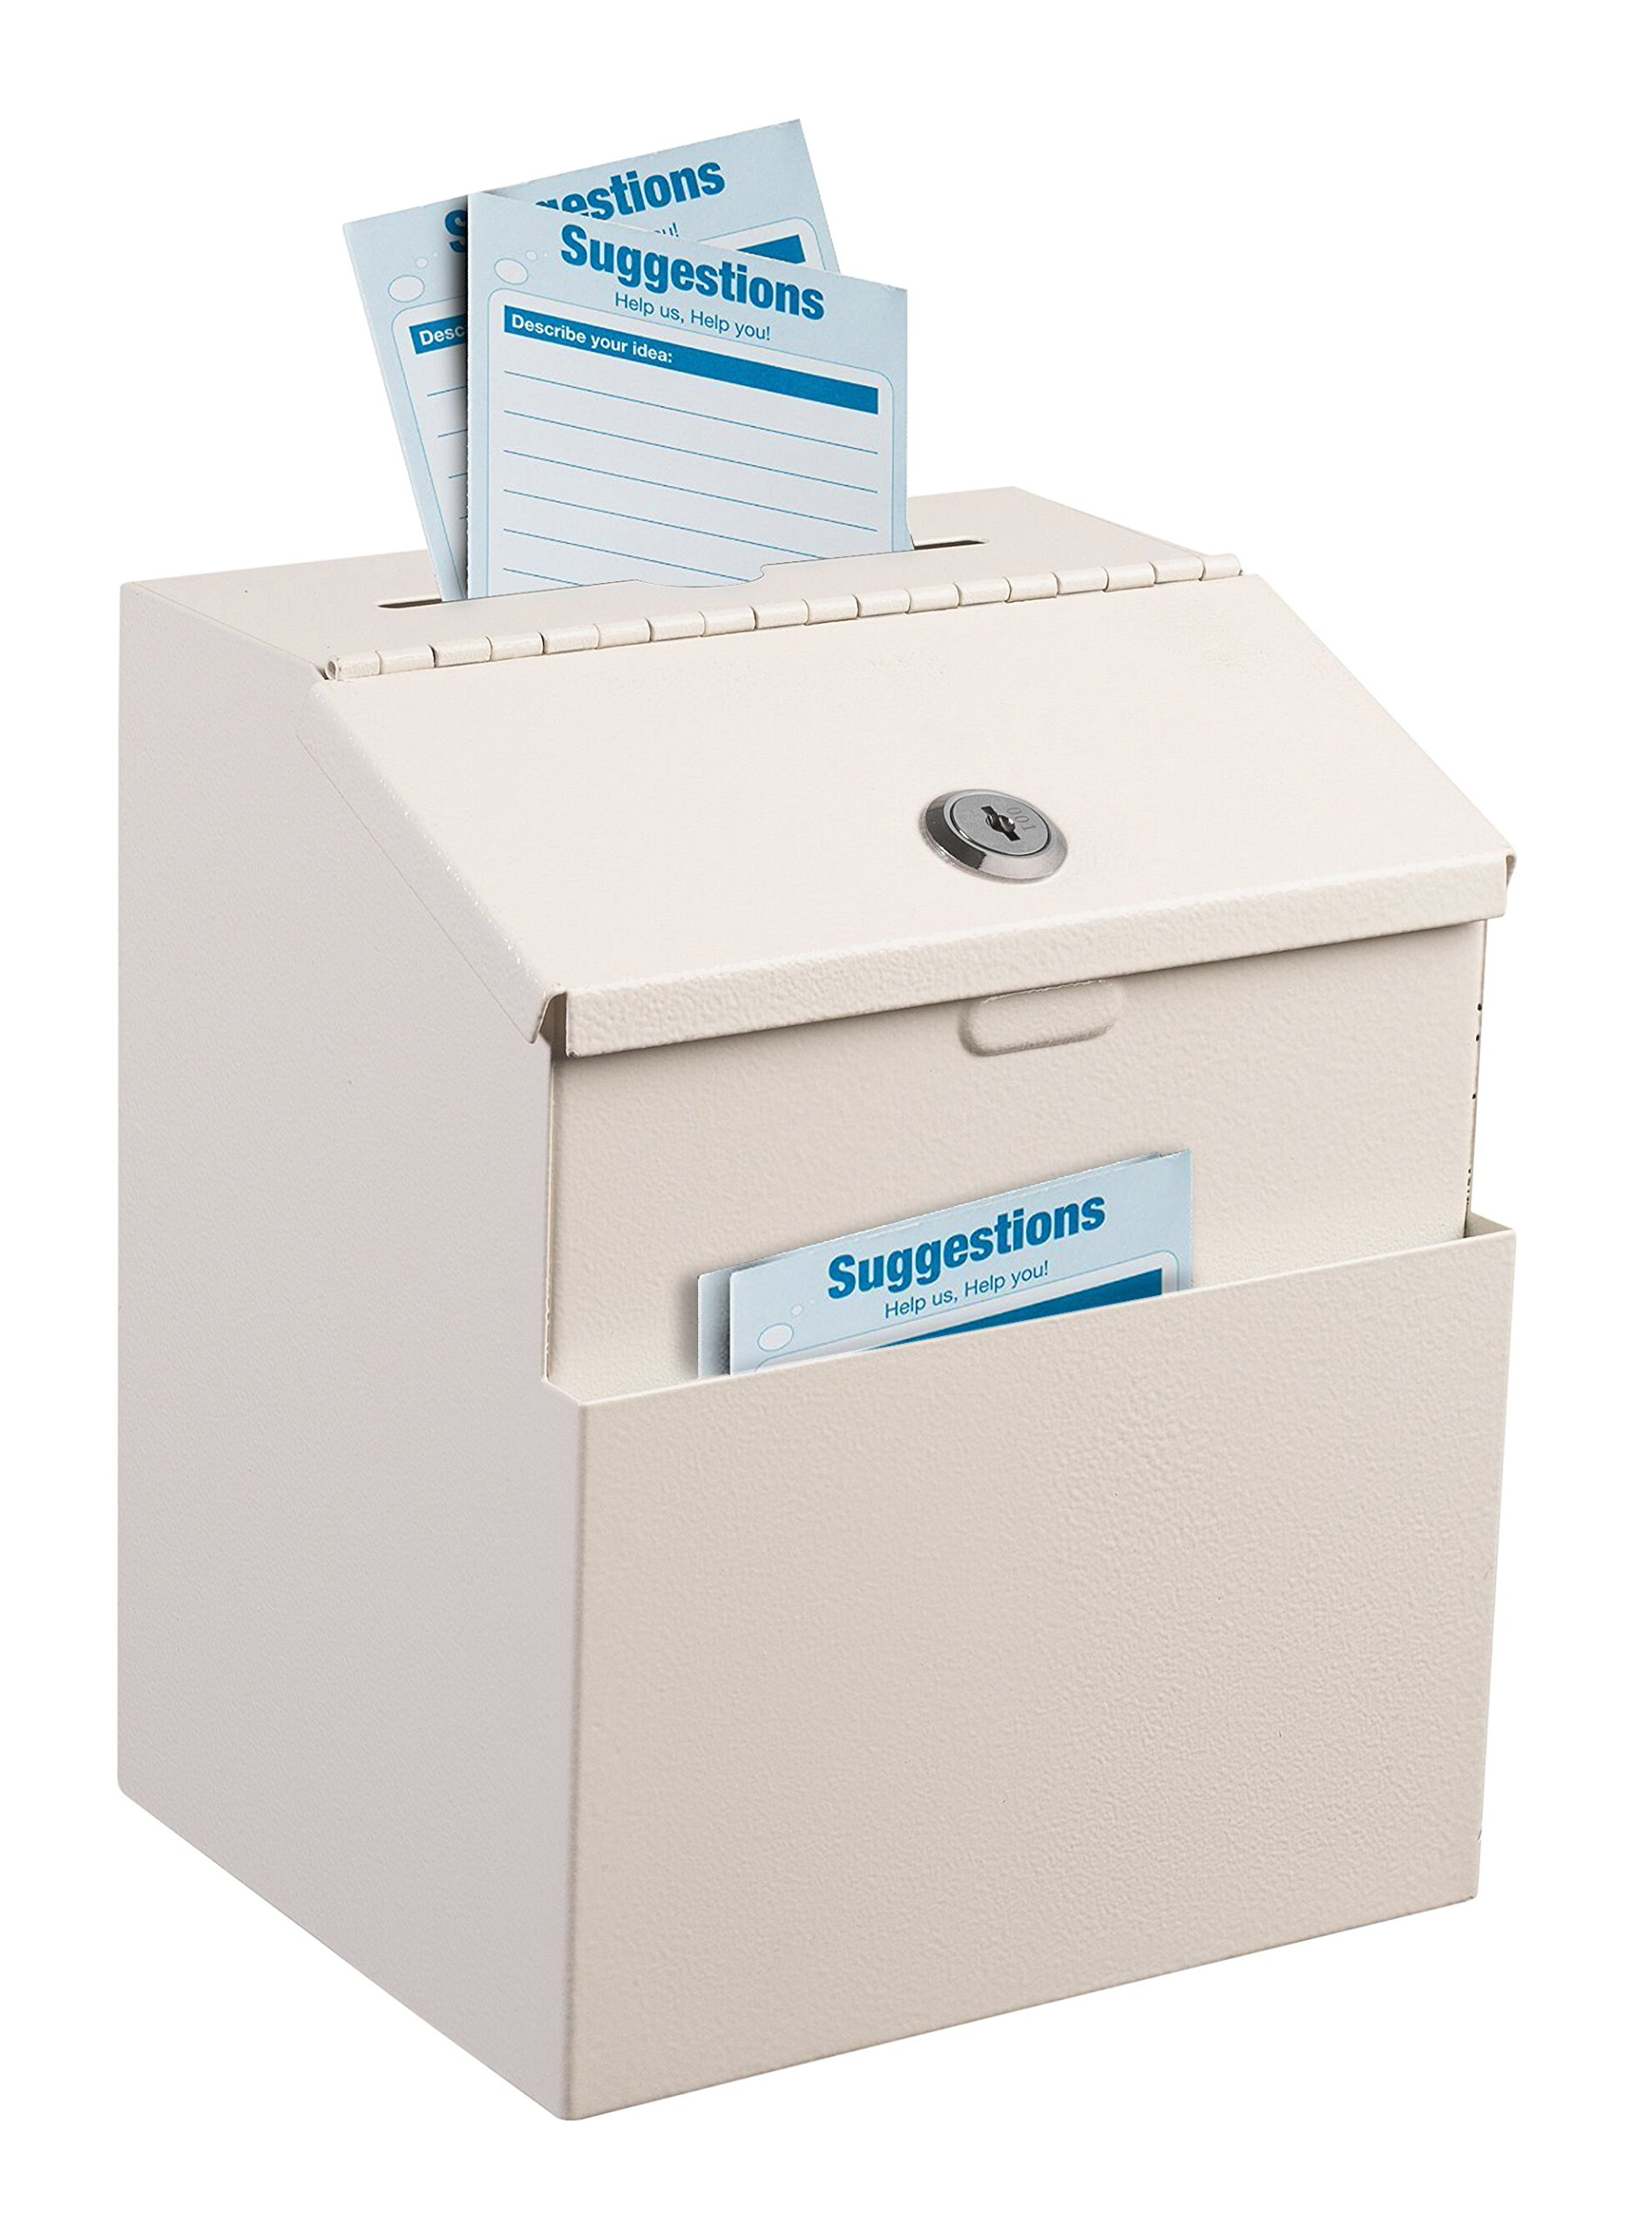 Adir Steel Suggestion Box with Lock (White) by Adir Corp.